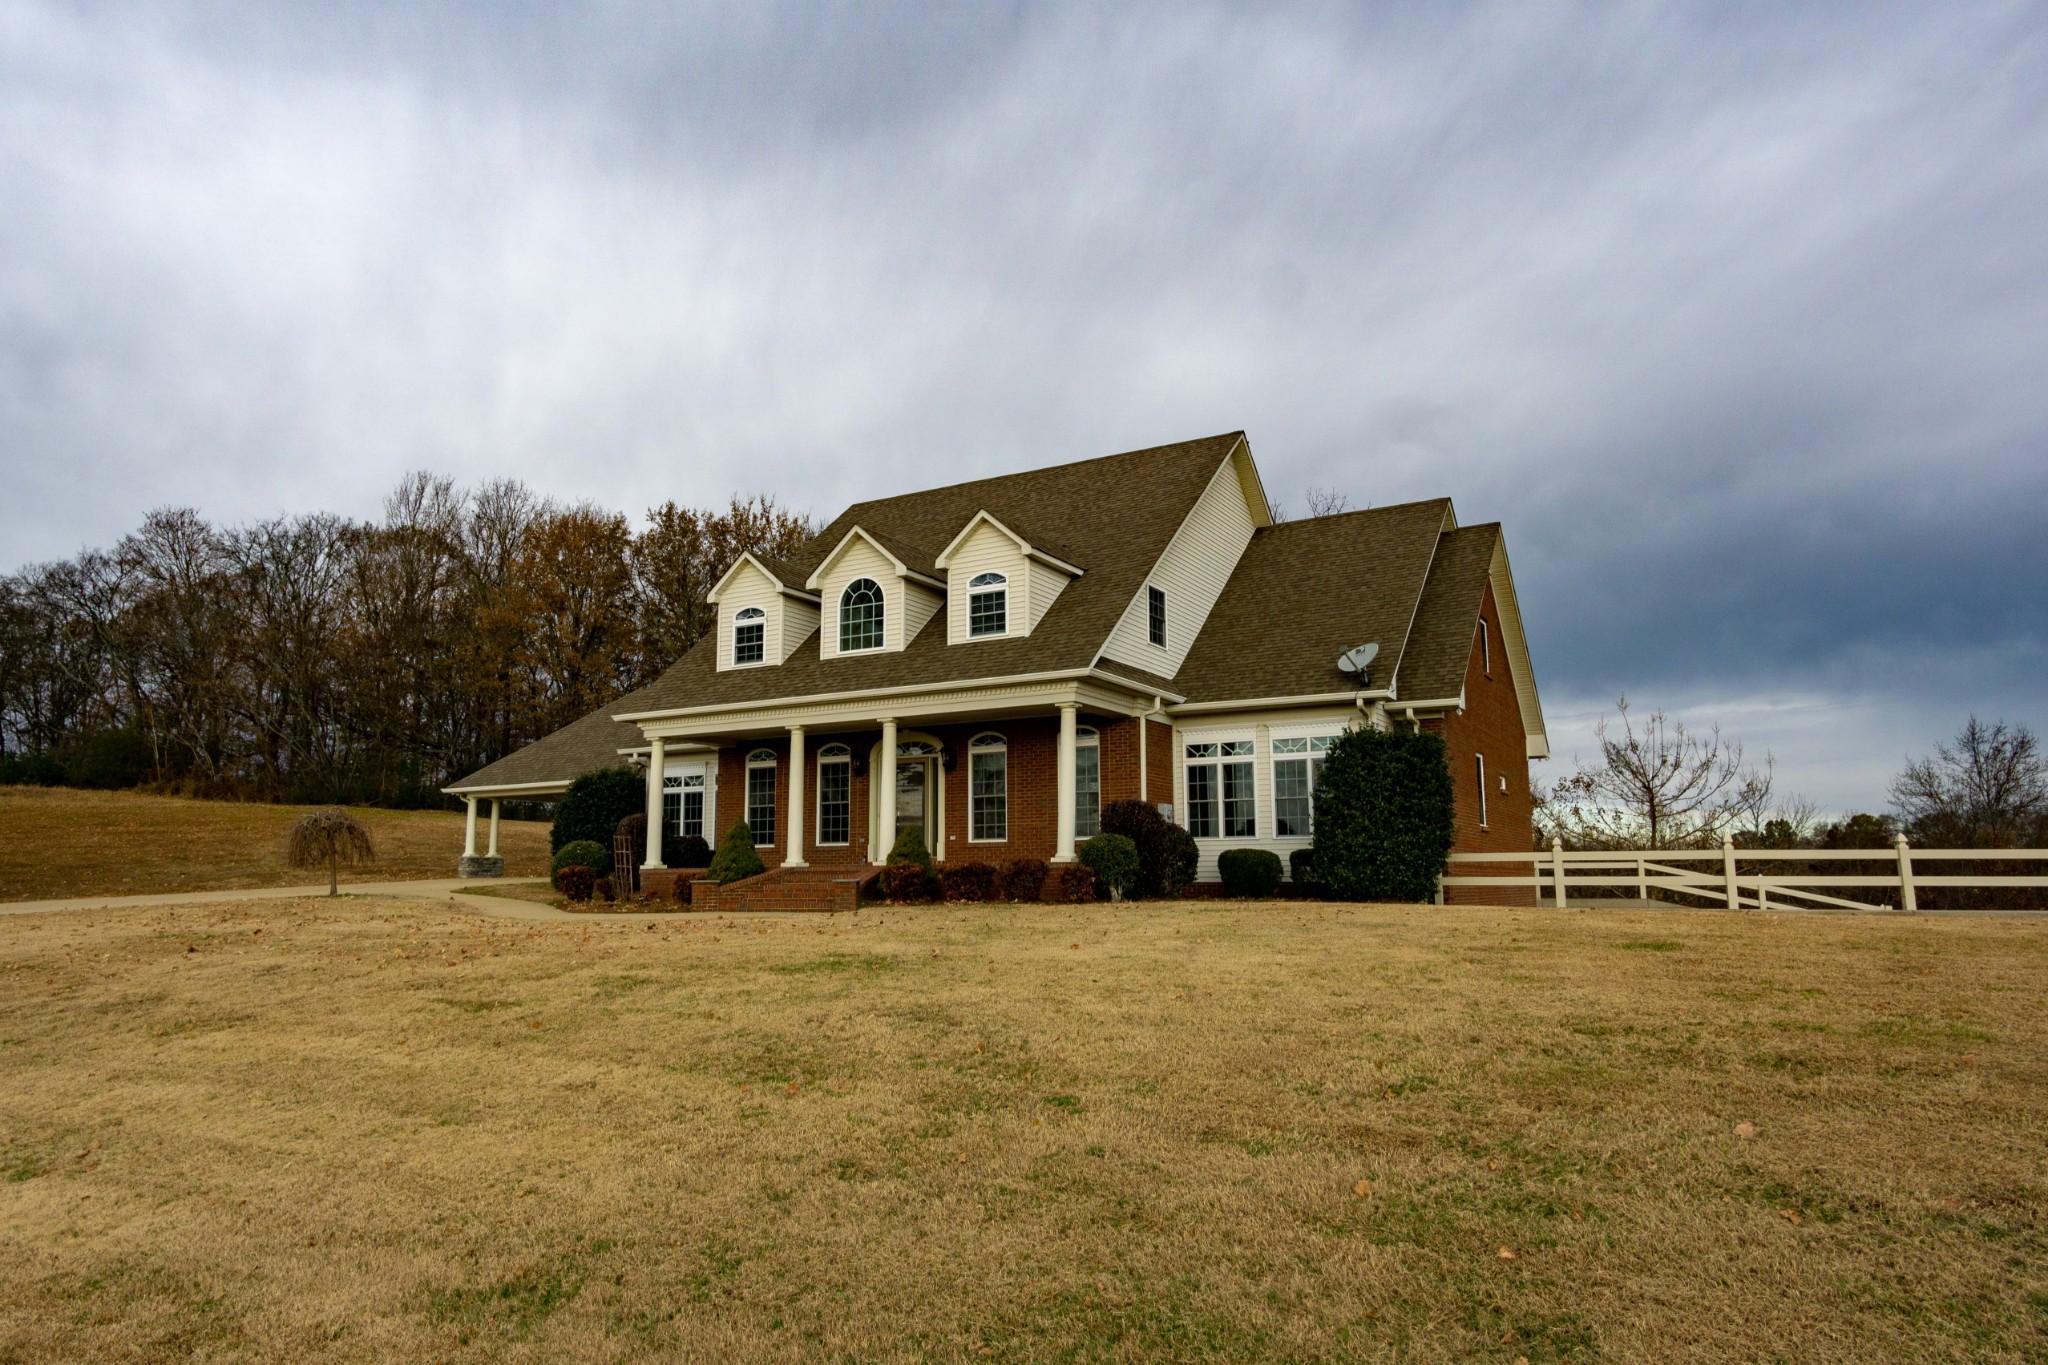 270 Ables Ln, Pulaski, TN 38478 - Pulaski, TN real estate listing